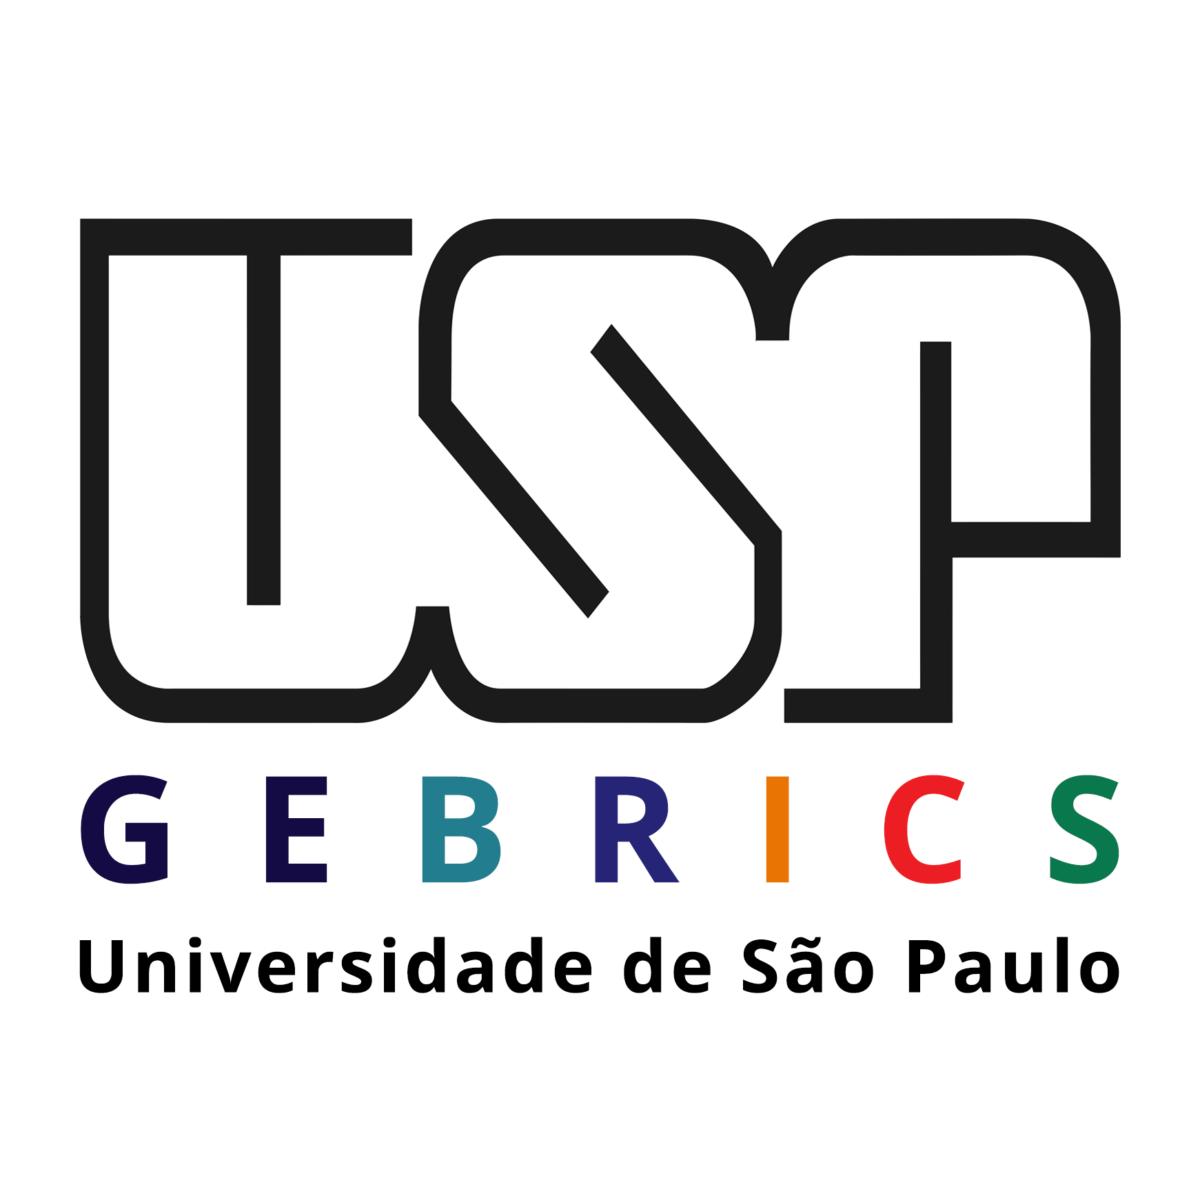 GEBRICS-USP-1200x1200.png